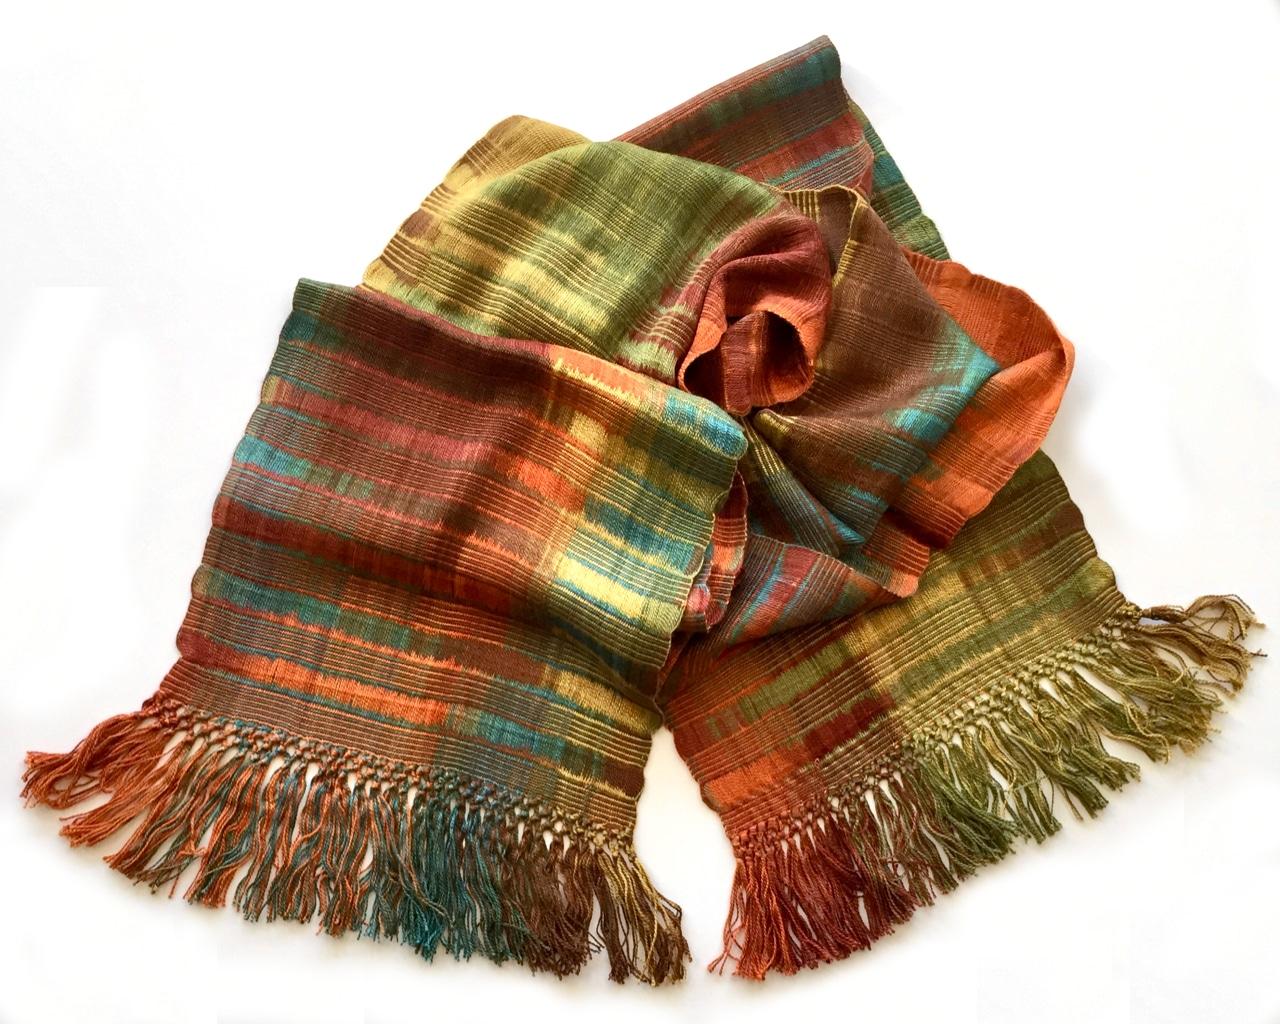 Autumn Rainbow - Lightweight Bamboo Open-Weave Handwoven Scarf 8 x 68